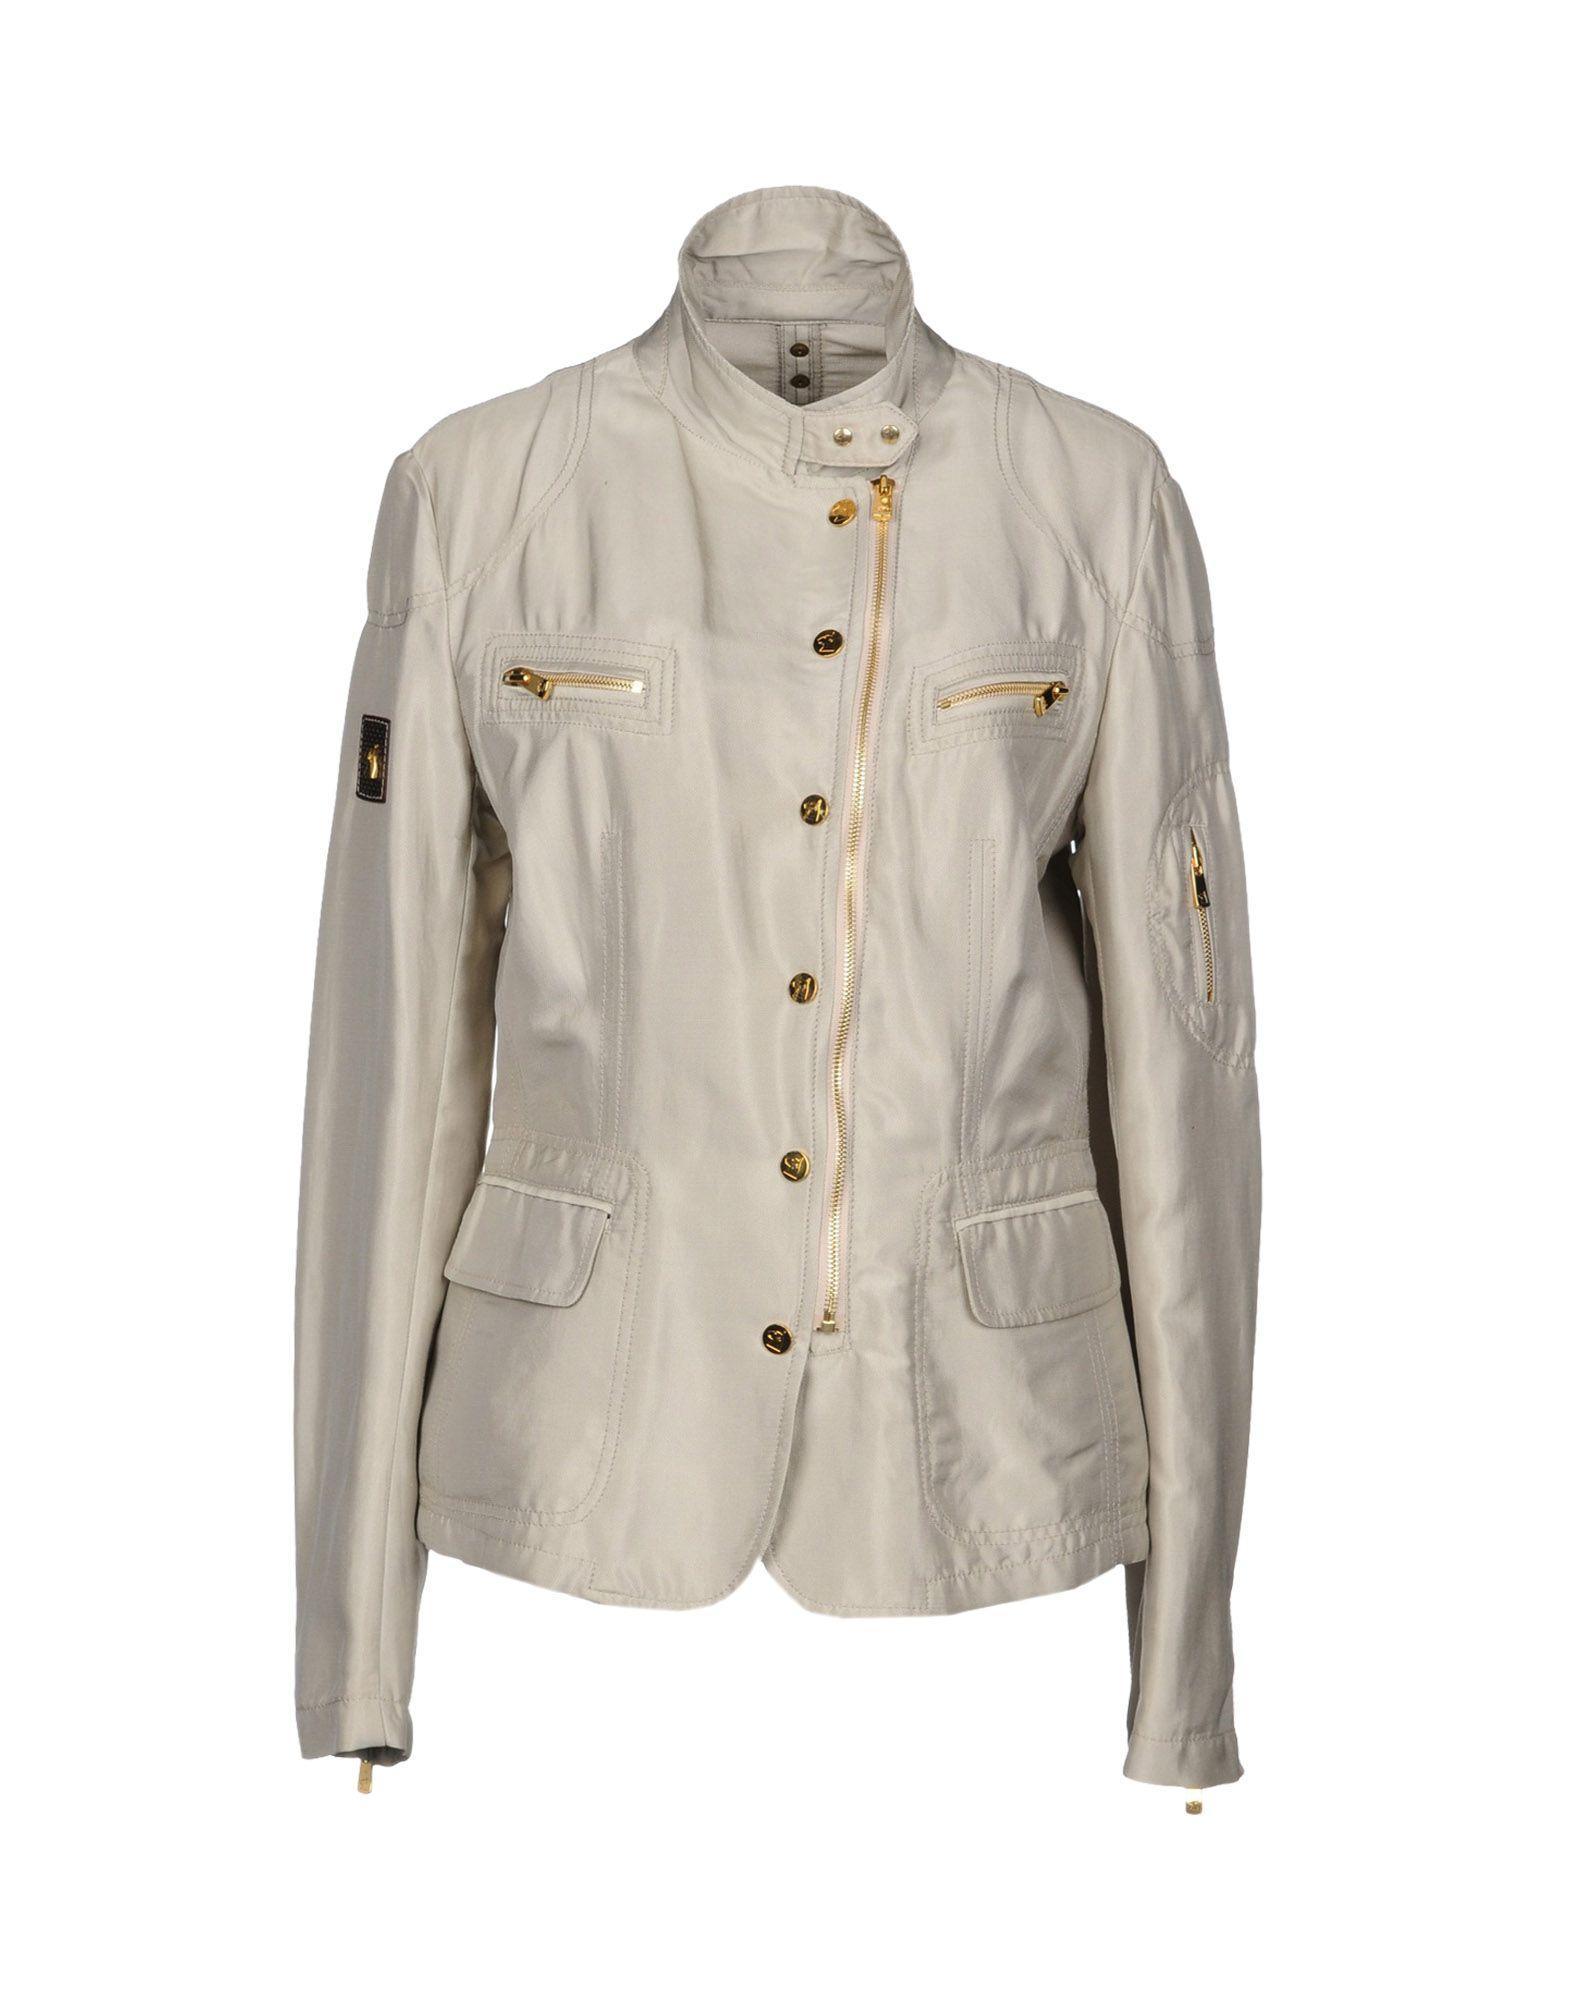 Montecore Jacket In Light Grey